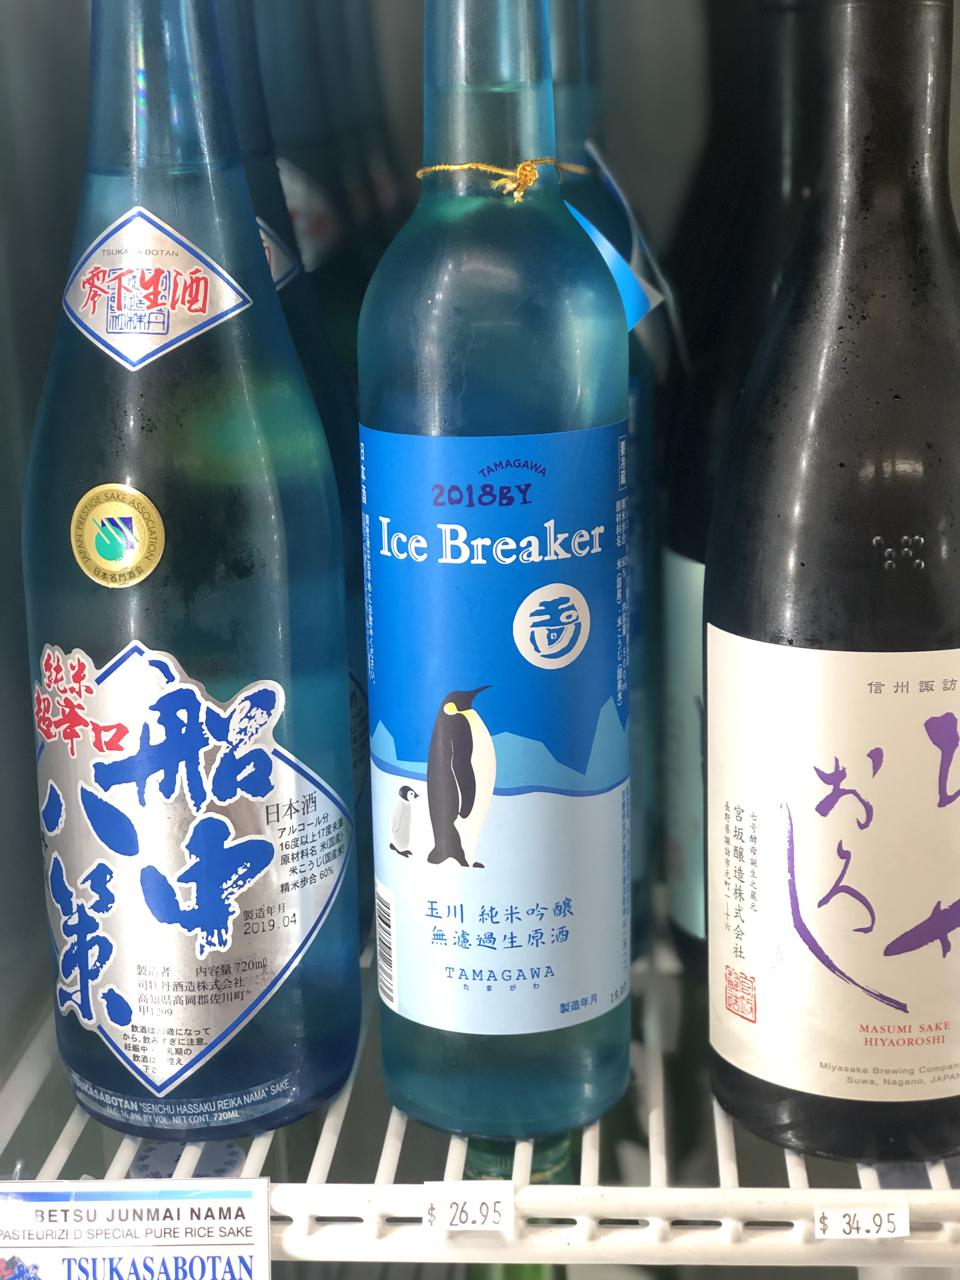 Icebreaker sake produced by Phil Harper, gold winning sake producer, is sold at The Sake Shop in Honolulu, Hawaii.